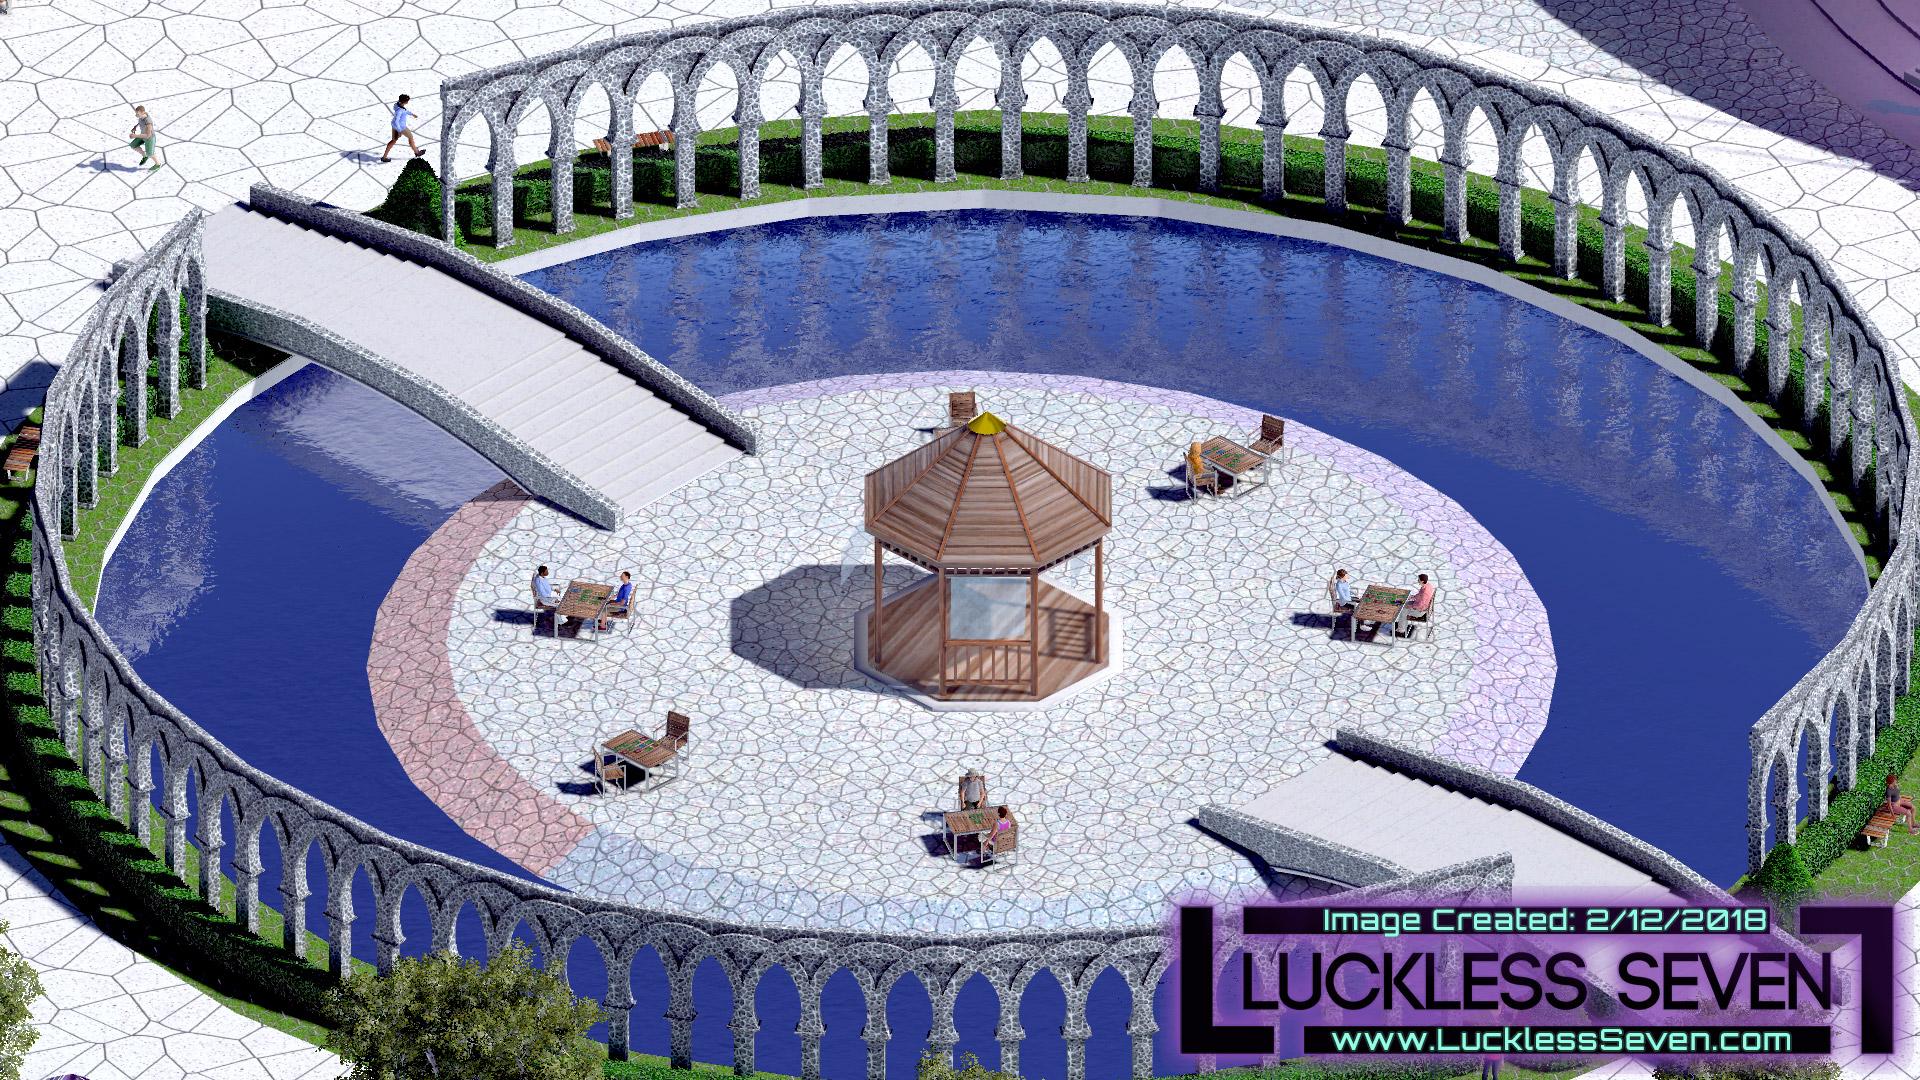 Luckless Seven Amethyst Casino E